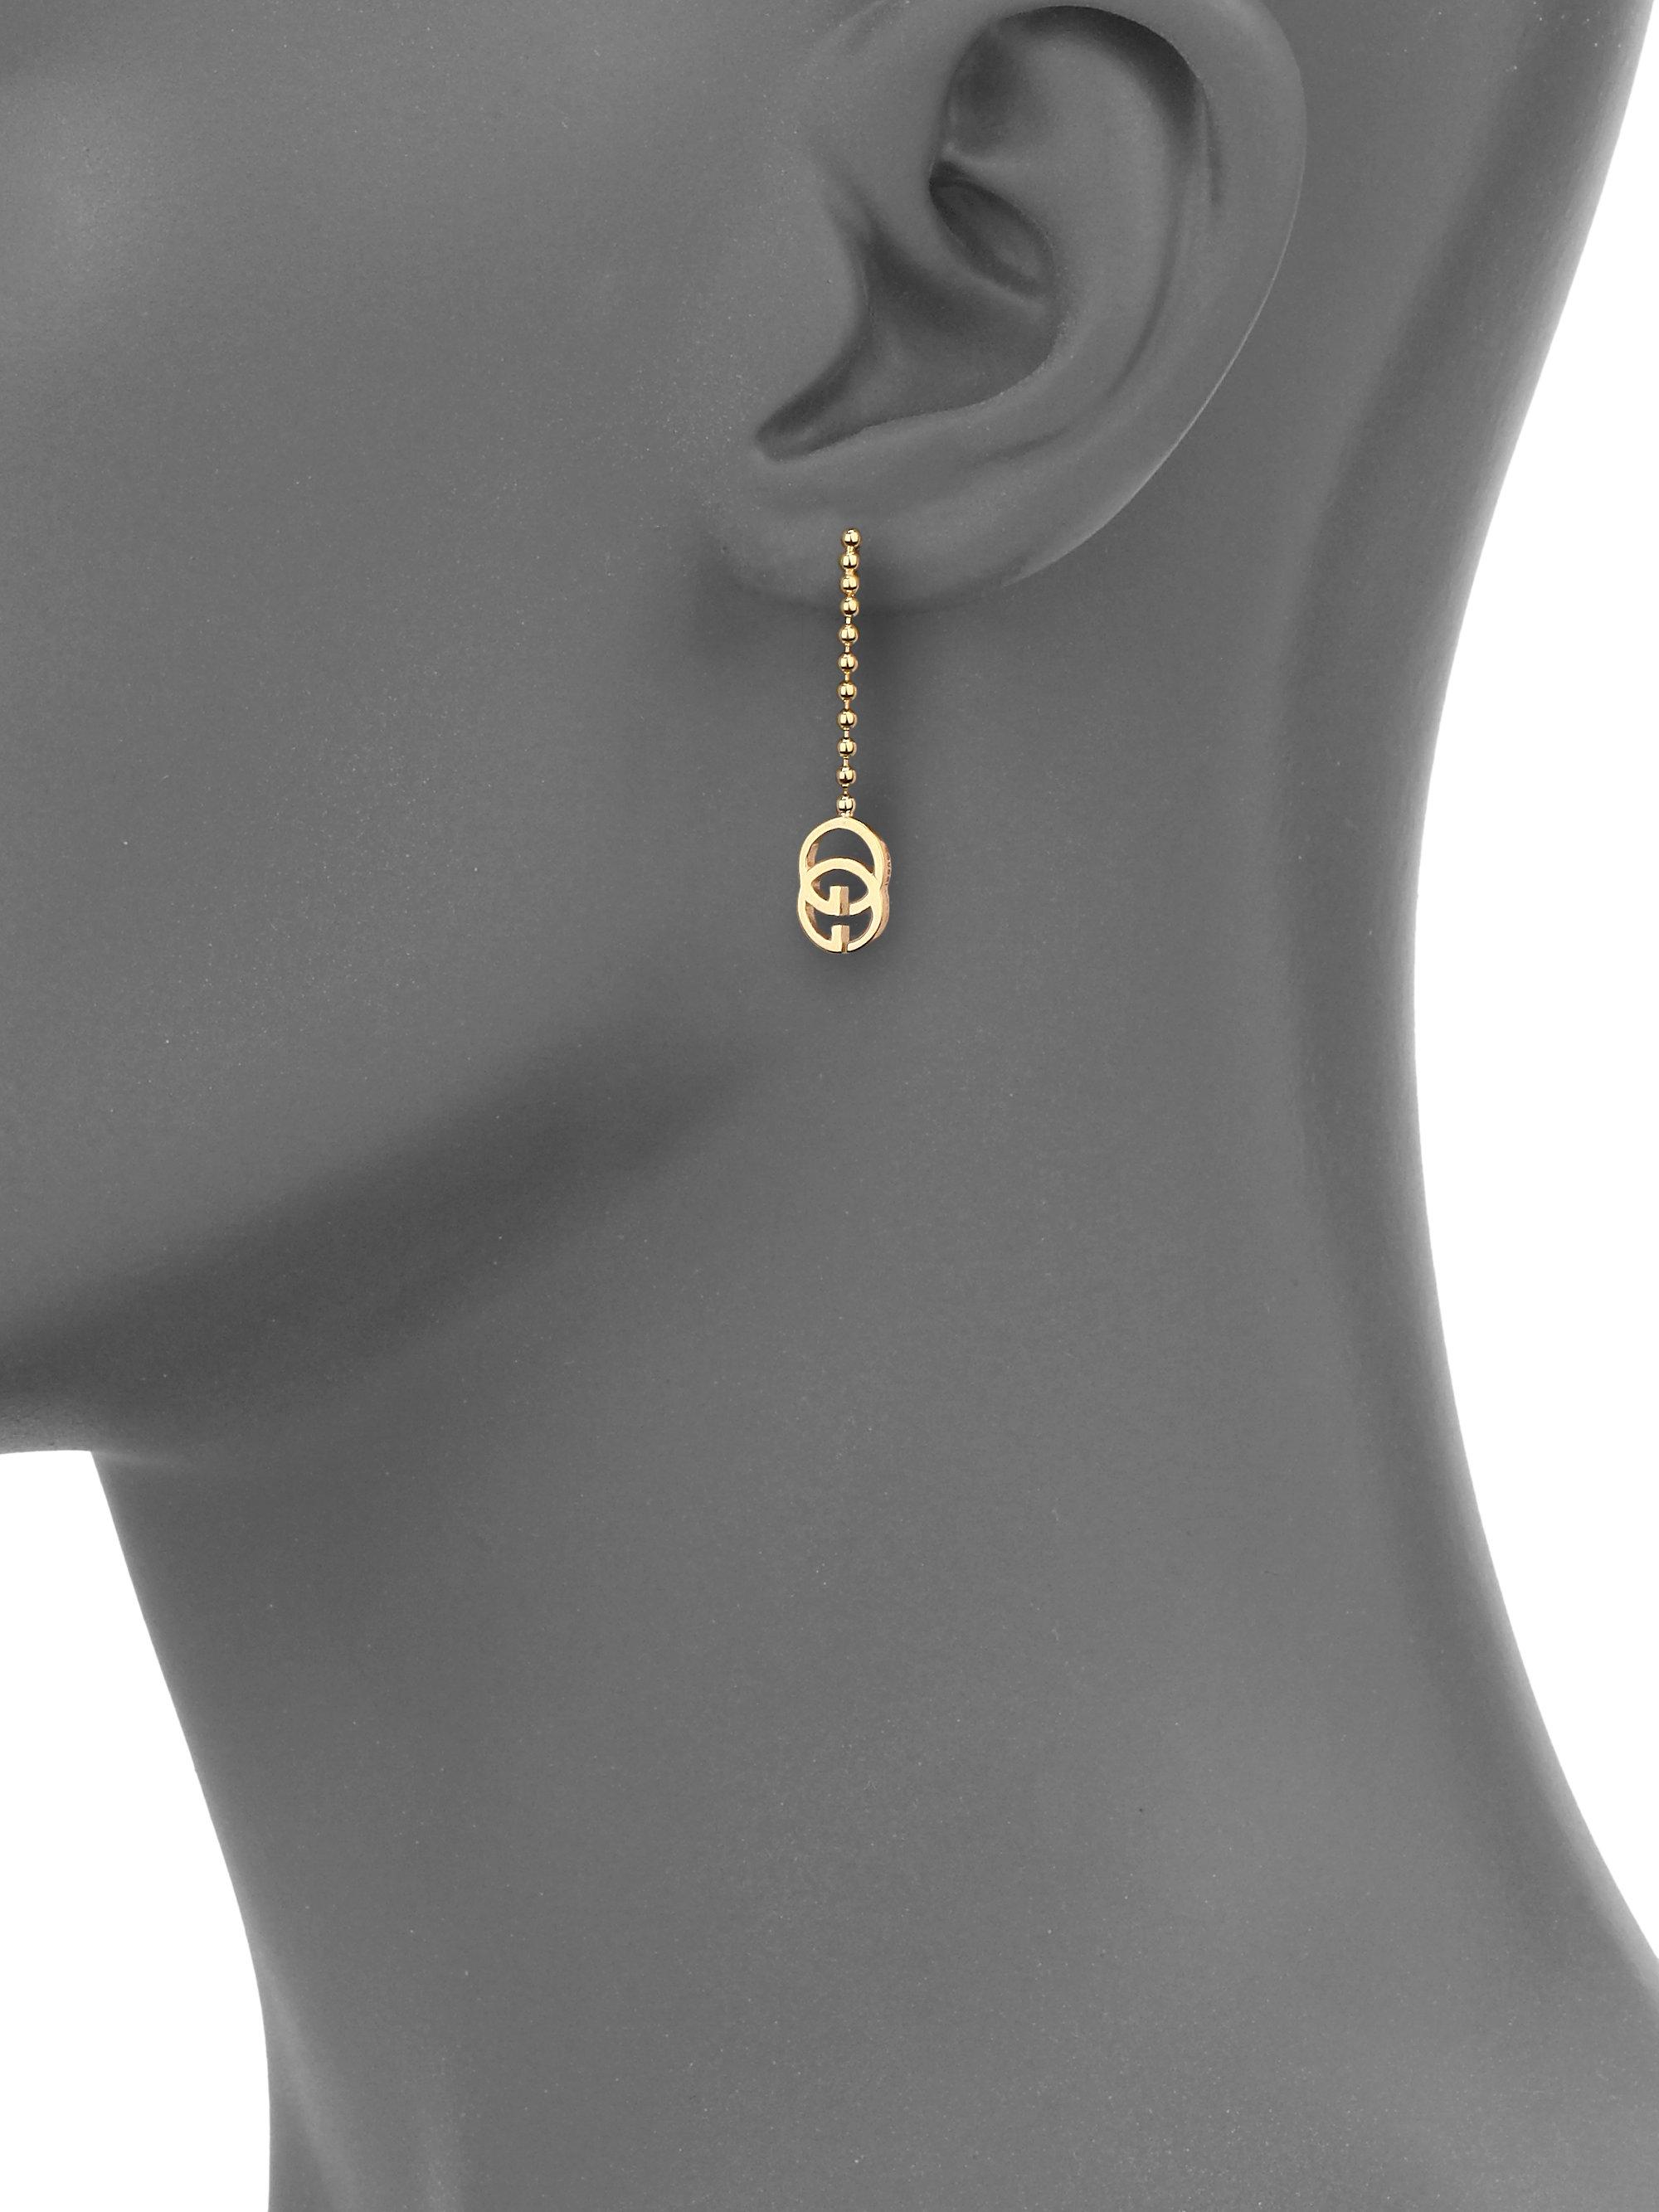 2afe71c39c6533 Gucci Running G 18k Yellow Gold Drop Earrings in Metallic - Lyst